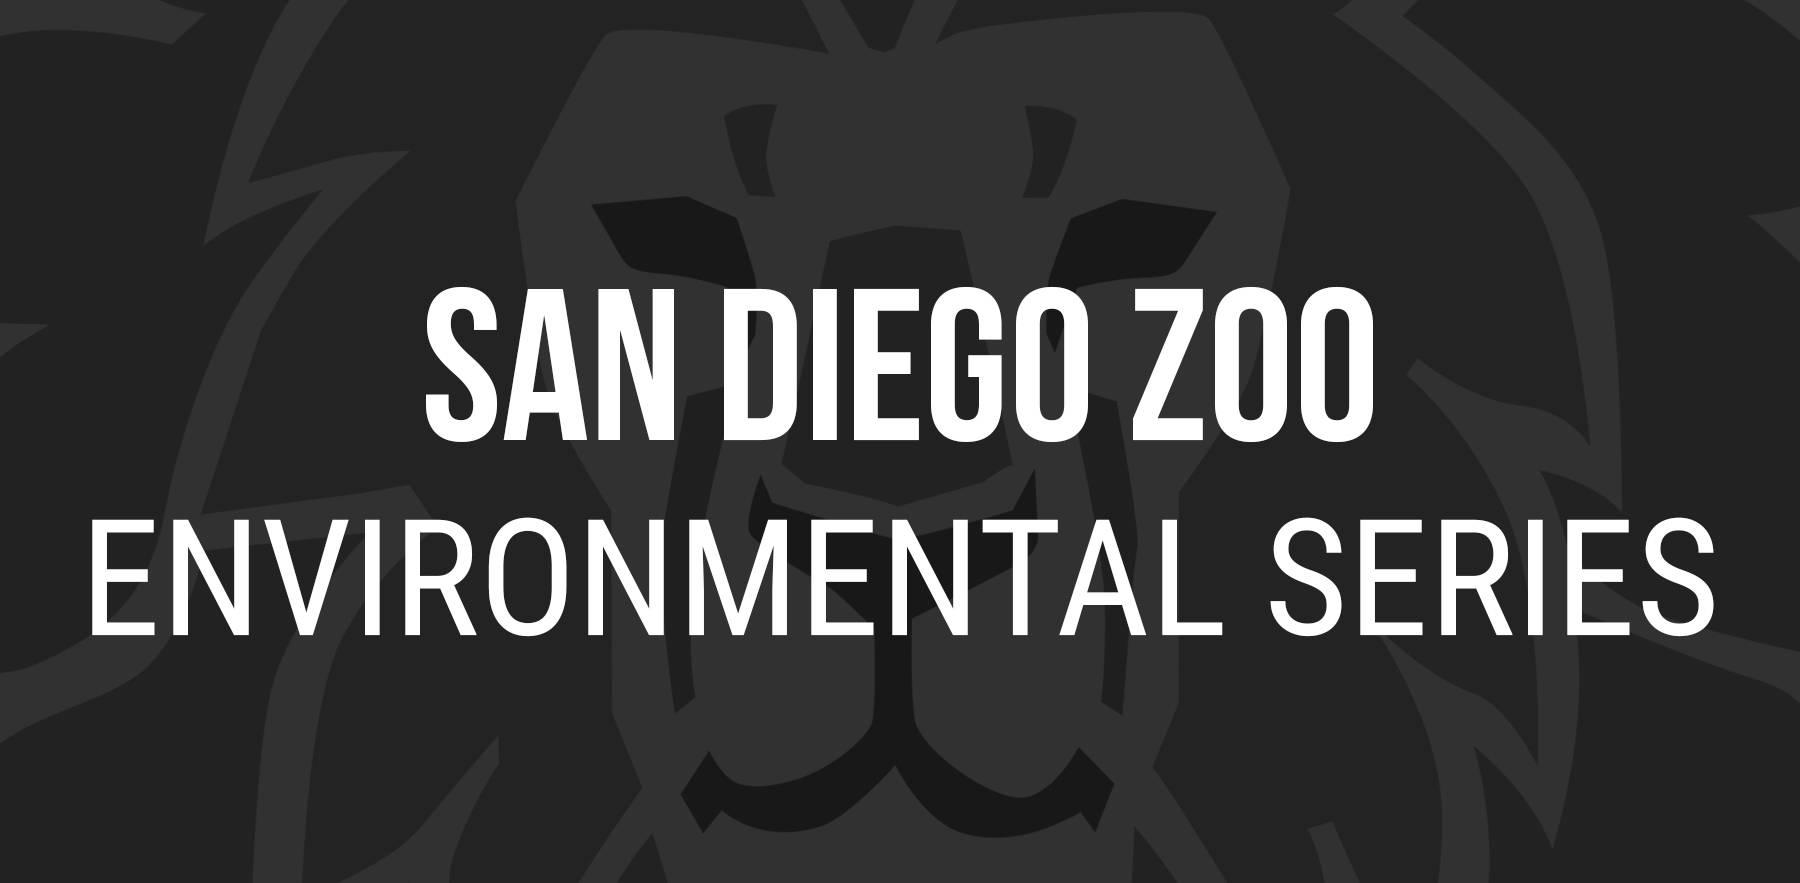 San Diego Zoo socks